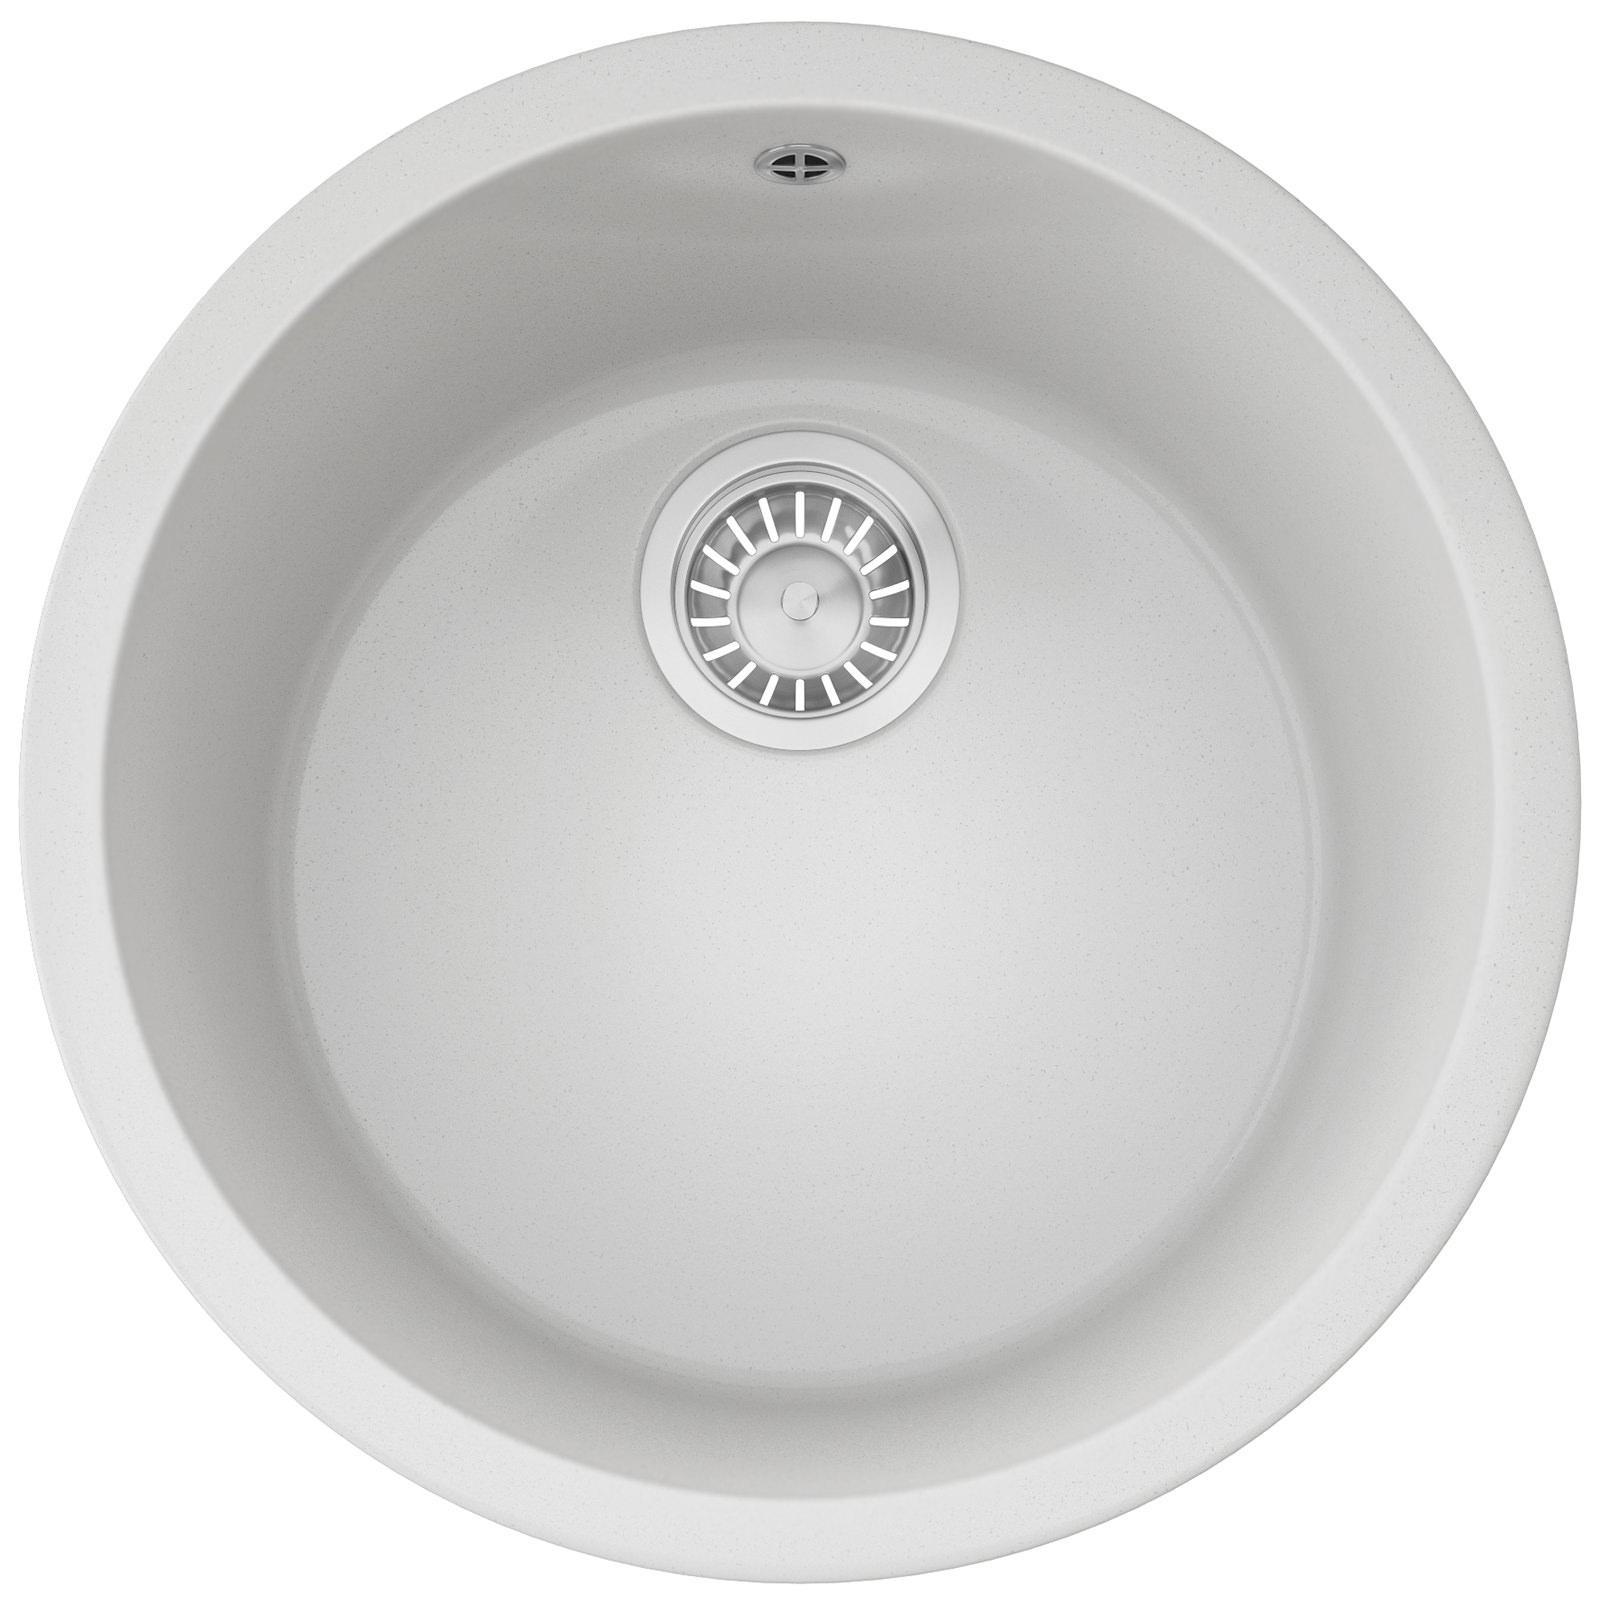 Franke Rotondo RBG 610 Fragranite Polar White 1.0 Bowl Inset Kitchen Sink  ...